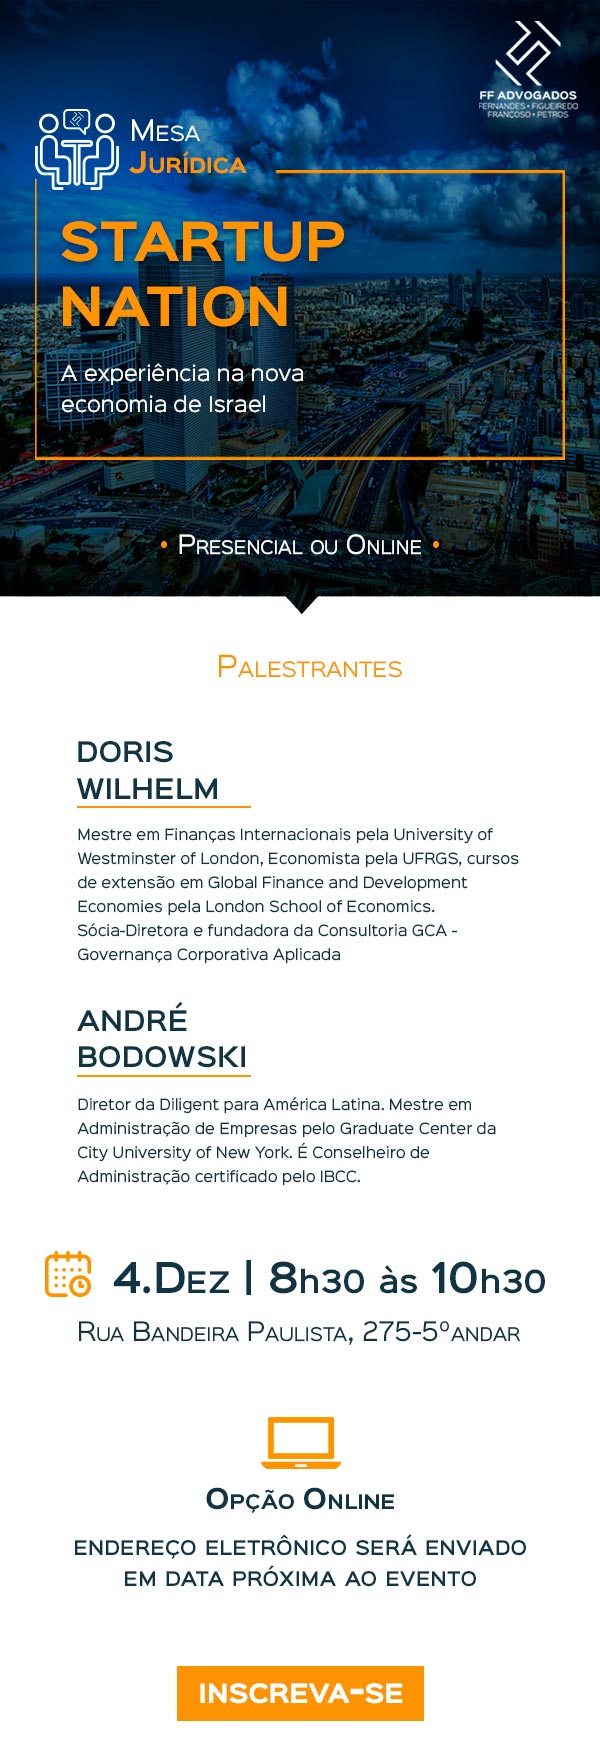 Mesa Jurídica do FF - A experiência na nova economia de Israel